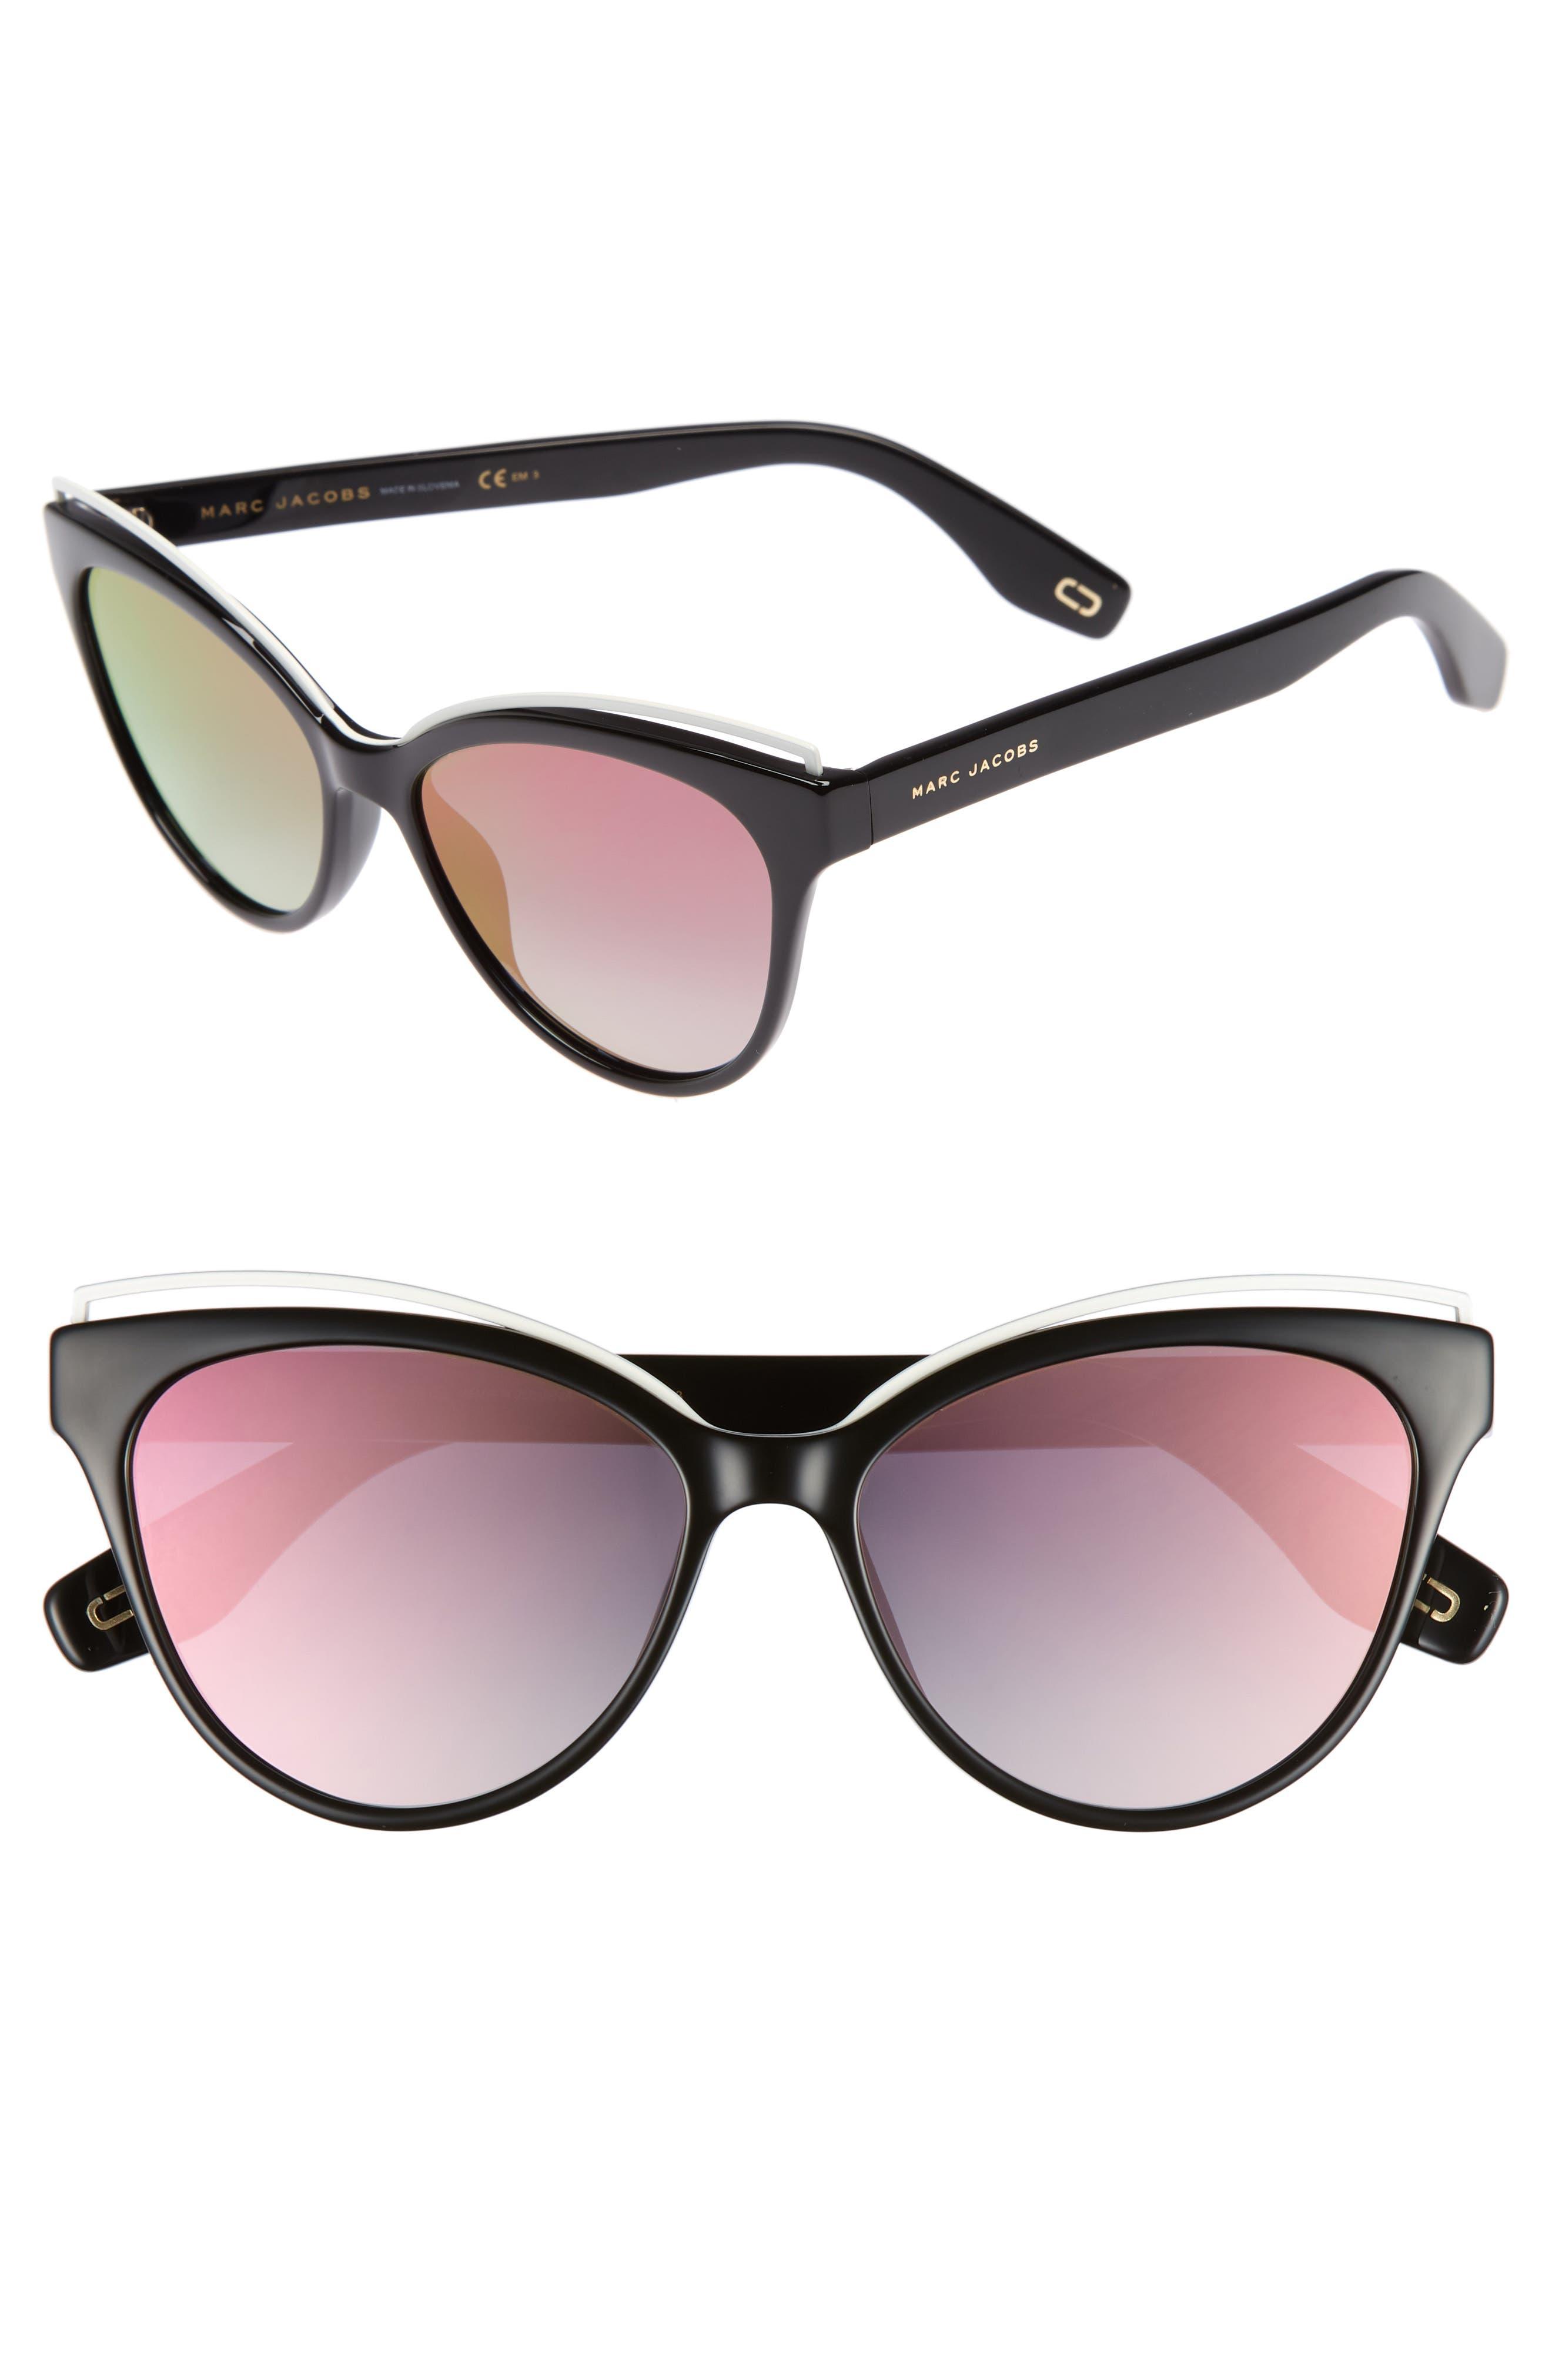 55mm Cat Eye Sunglasses,                         Main,                         color, Black/ Pink